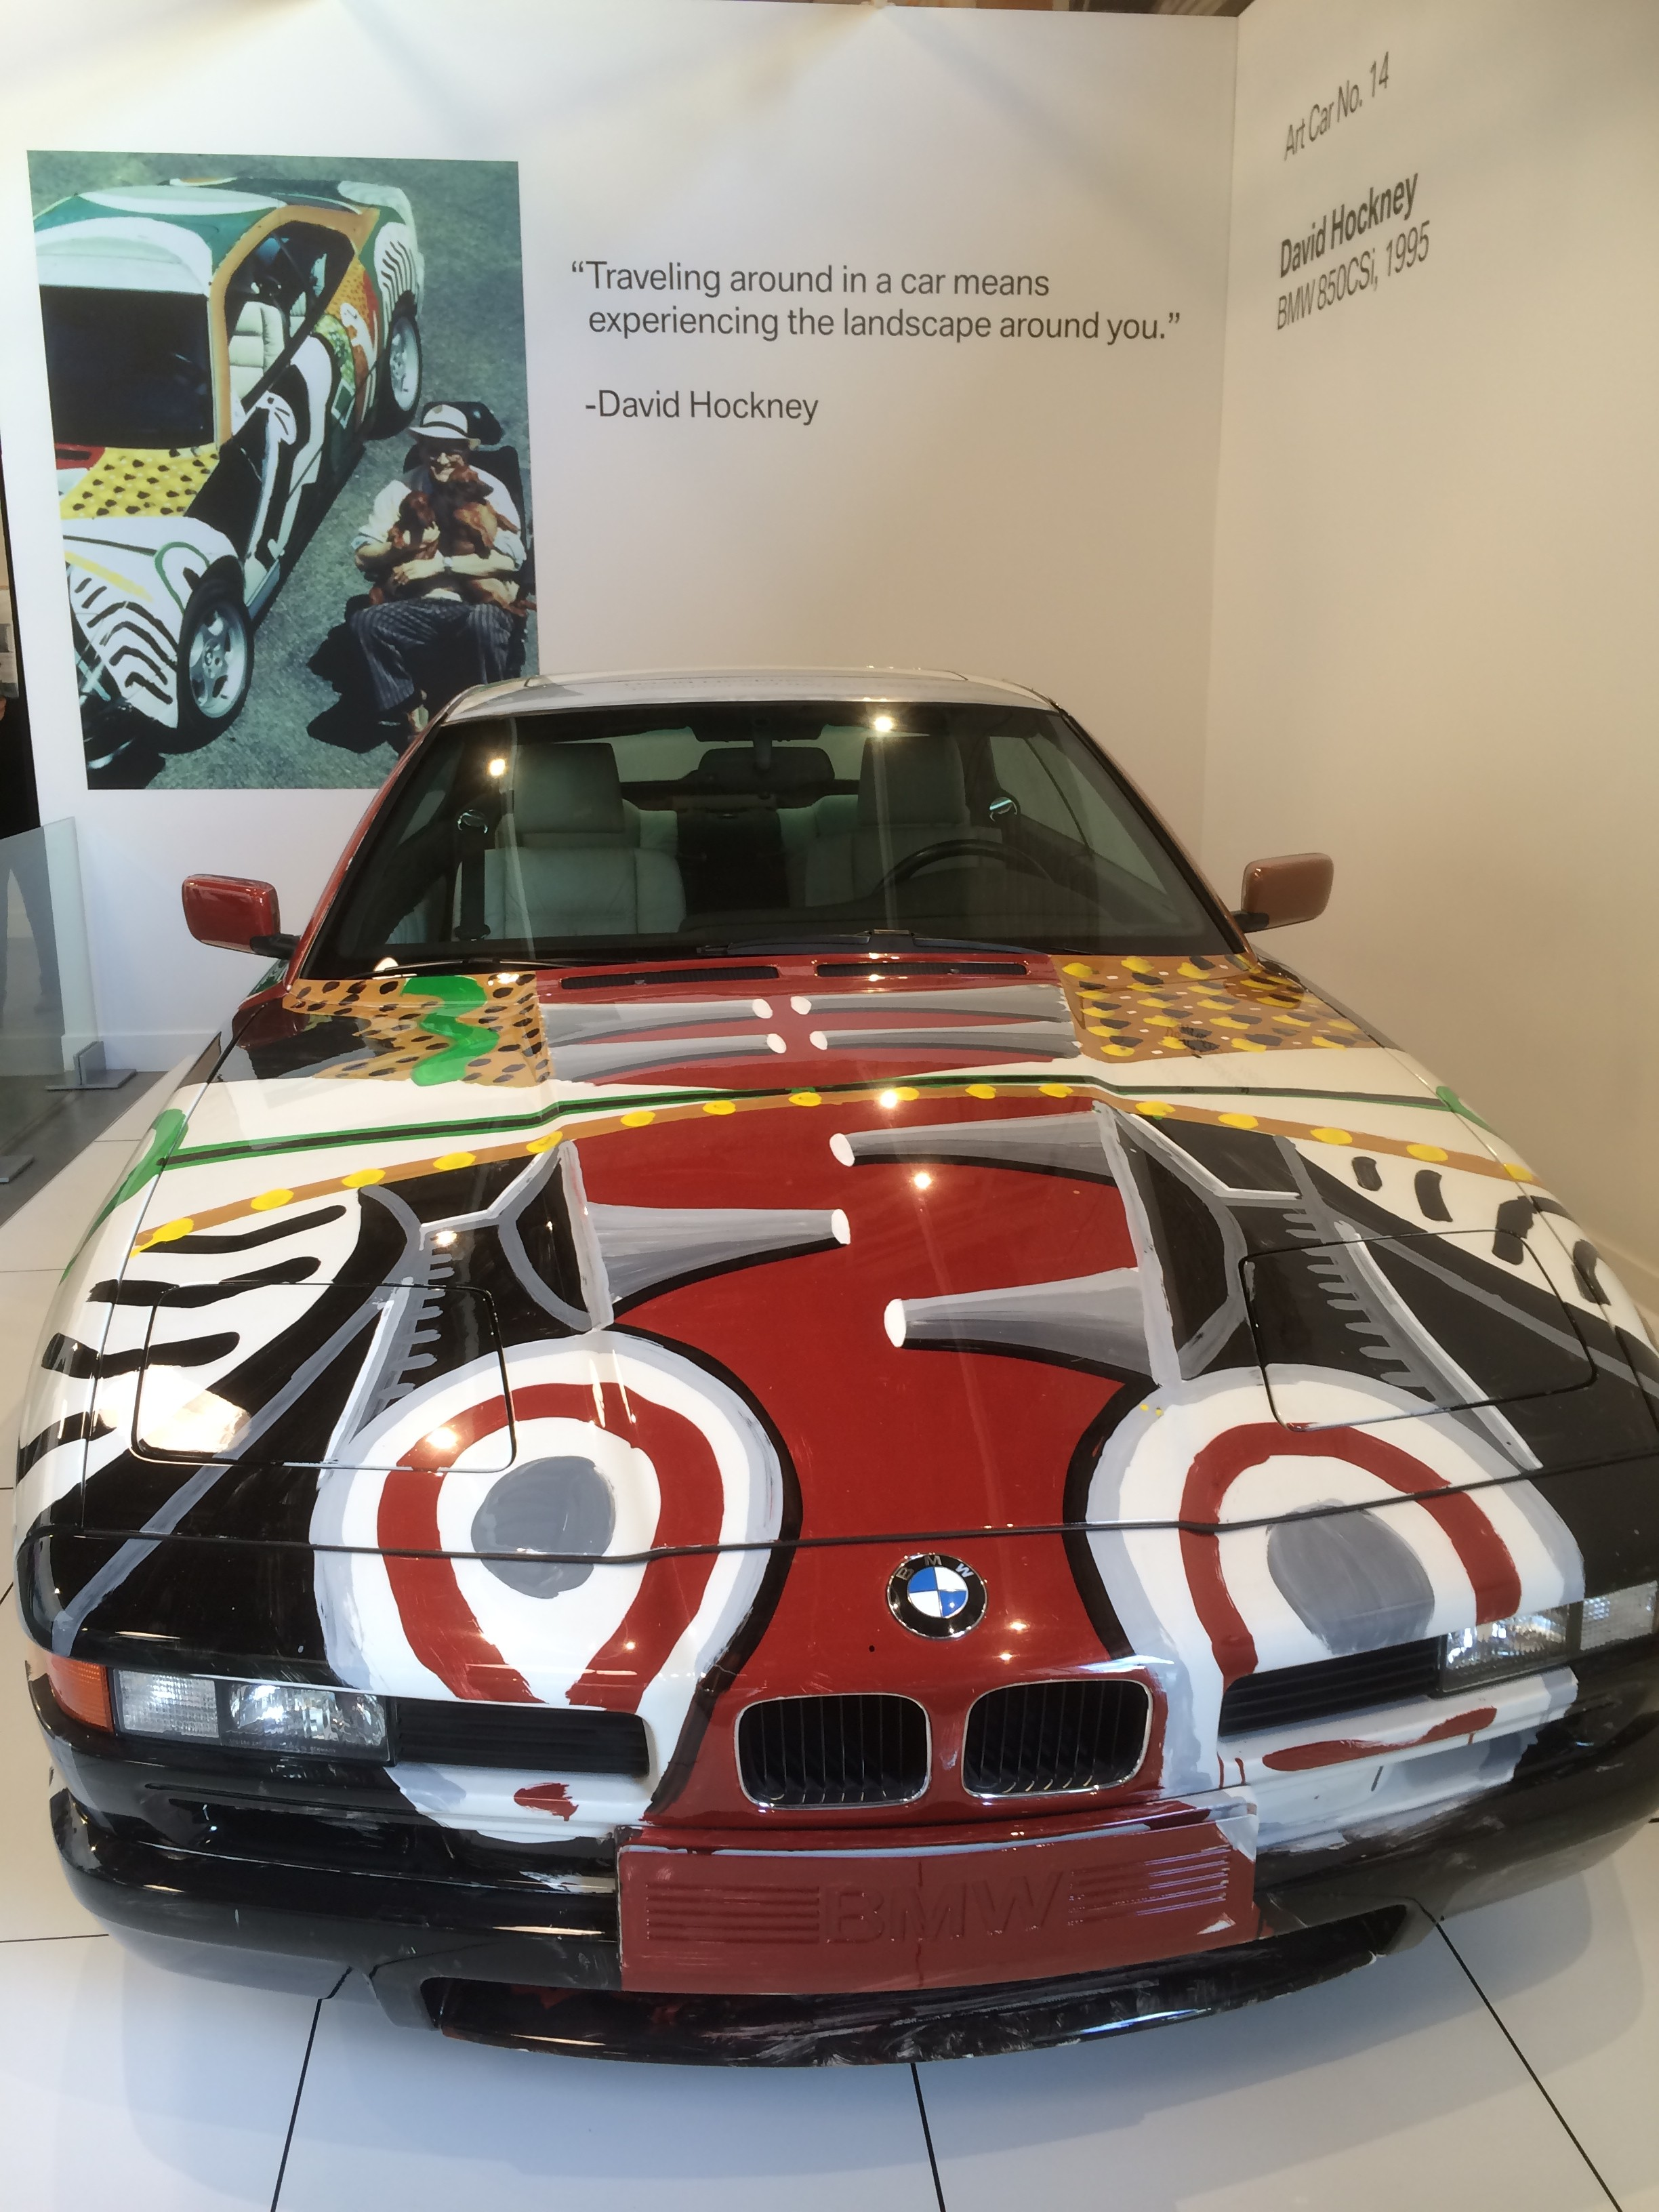 BMW Painted By David Hockney